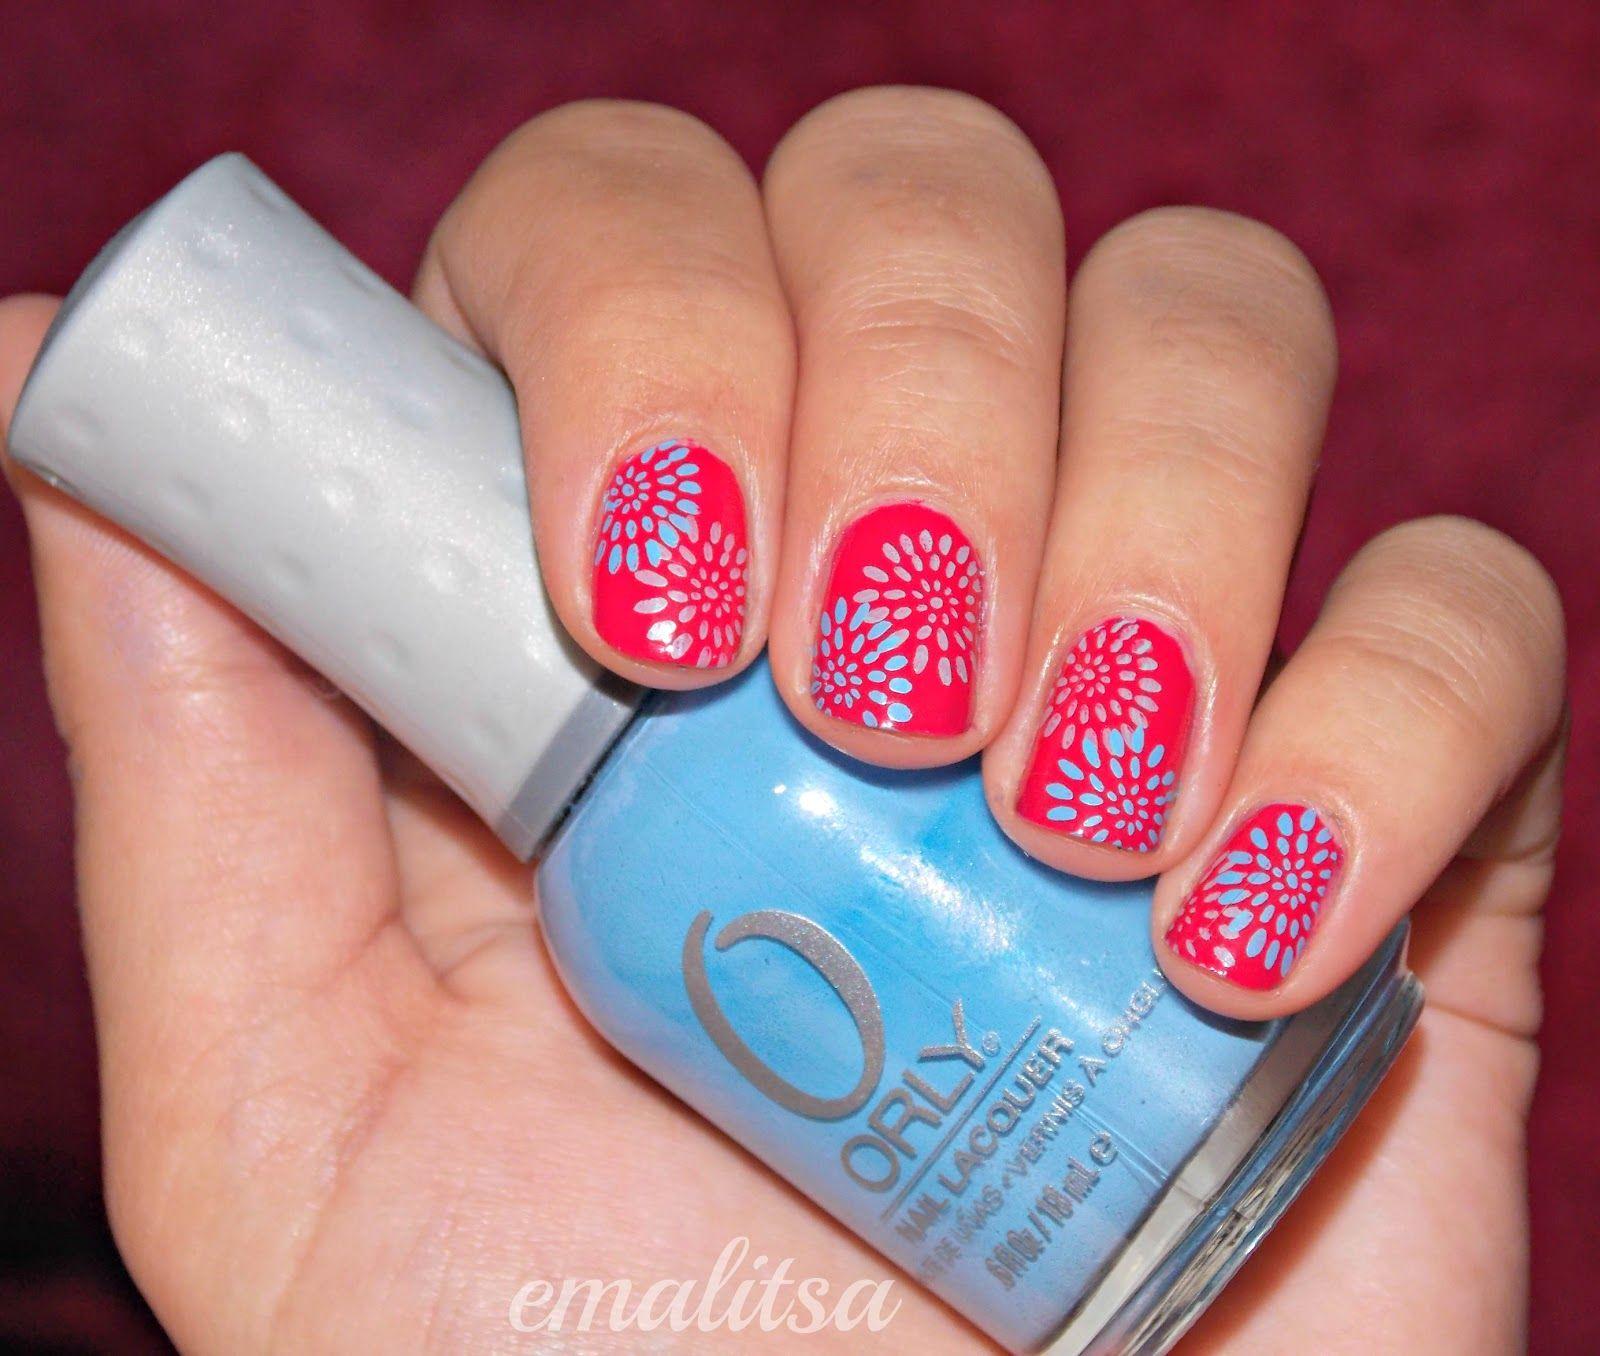 orly-floral-nail-art.jpg 1,600×1,356 pixels